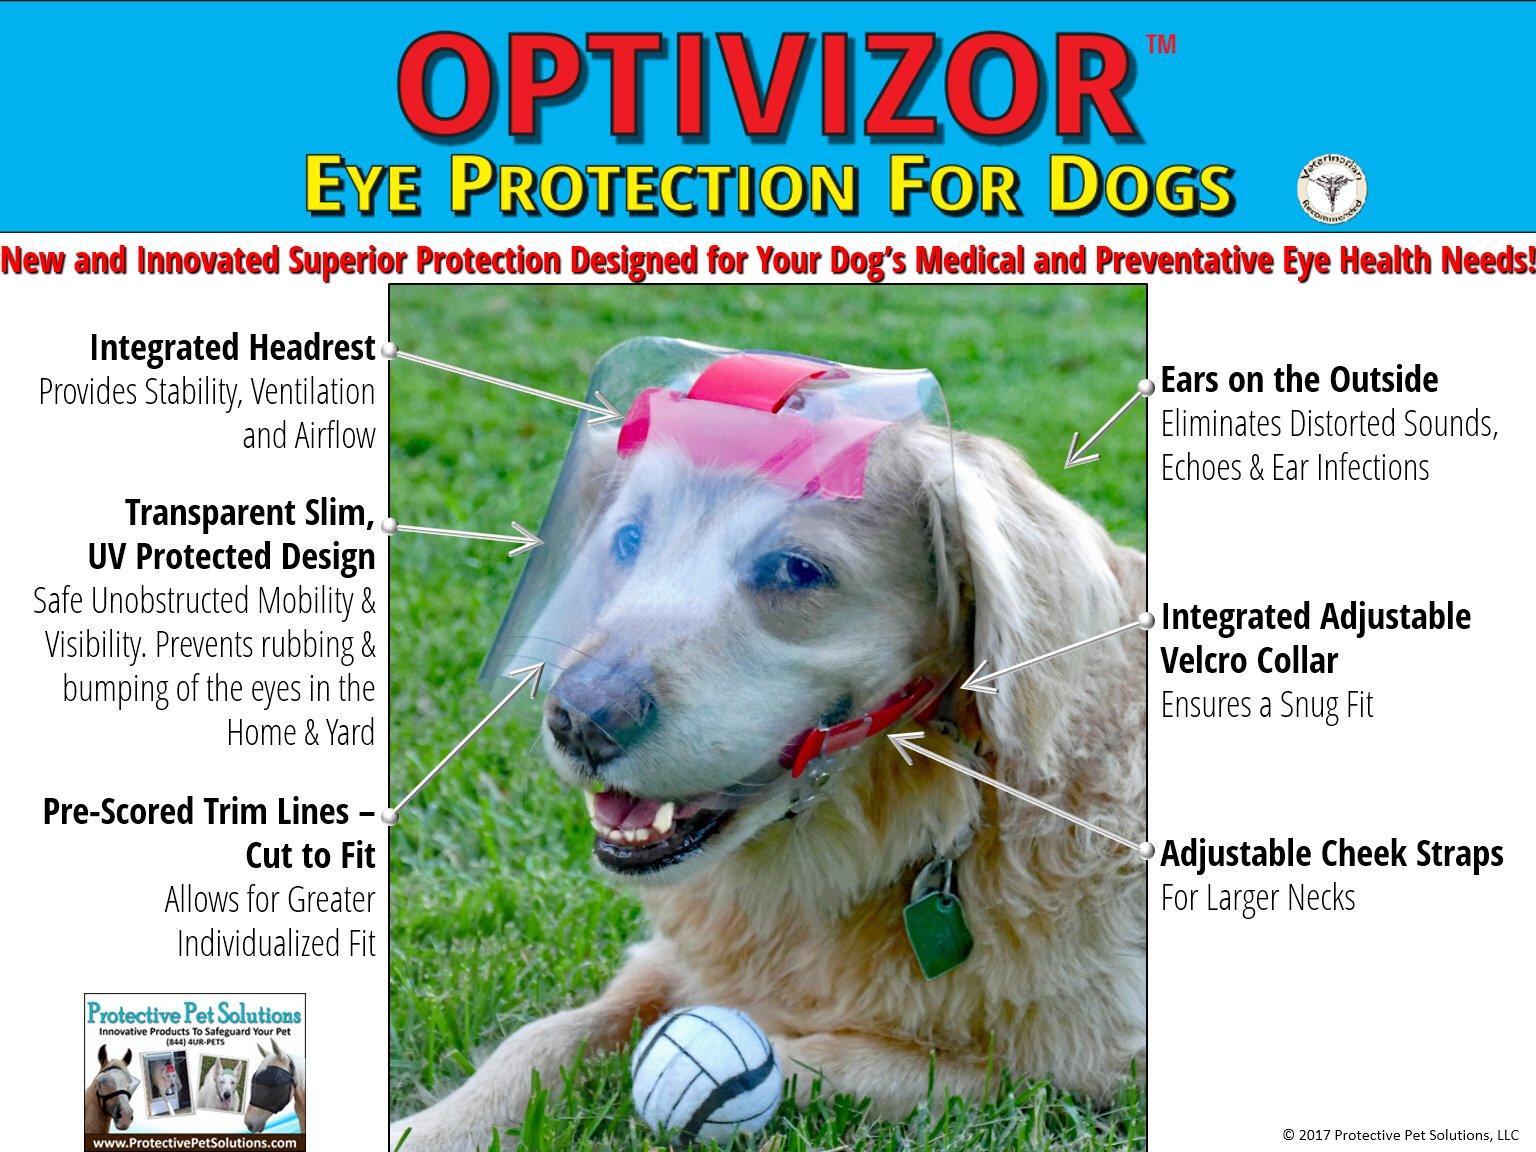 Optivizor Regular Snout Clear 92% UV Medical/Preventative Eye Protection (Goggles/Sunglasses) for Dogs (Size Large) by Optivizor